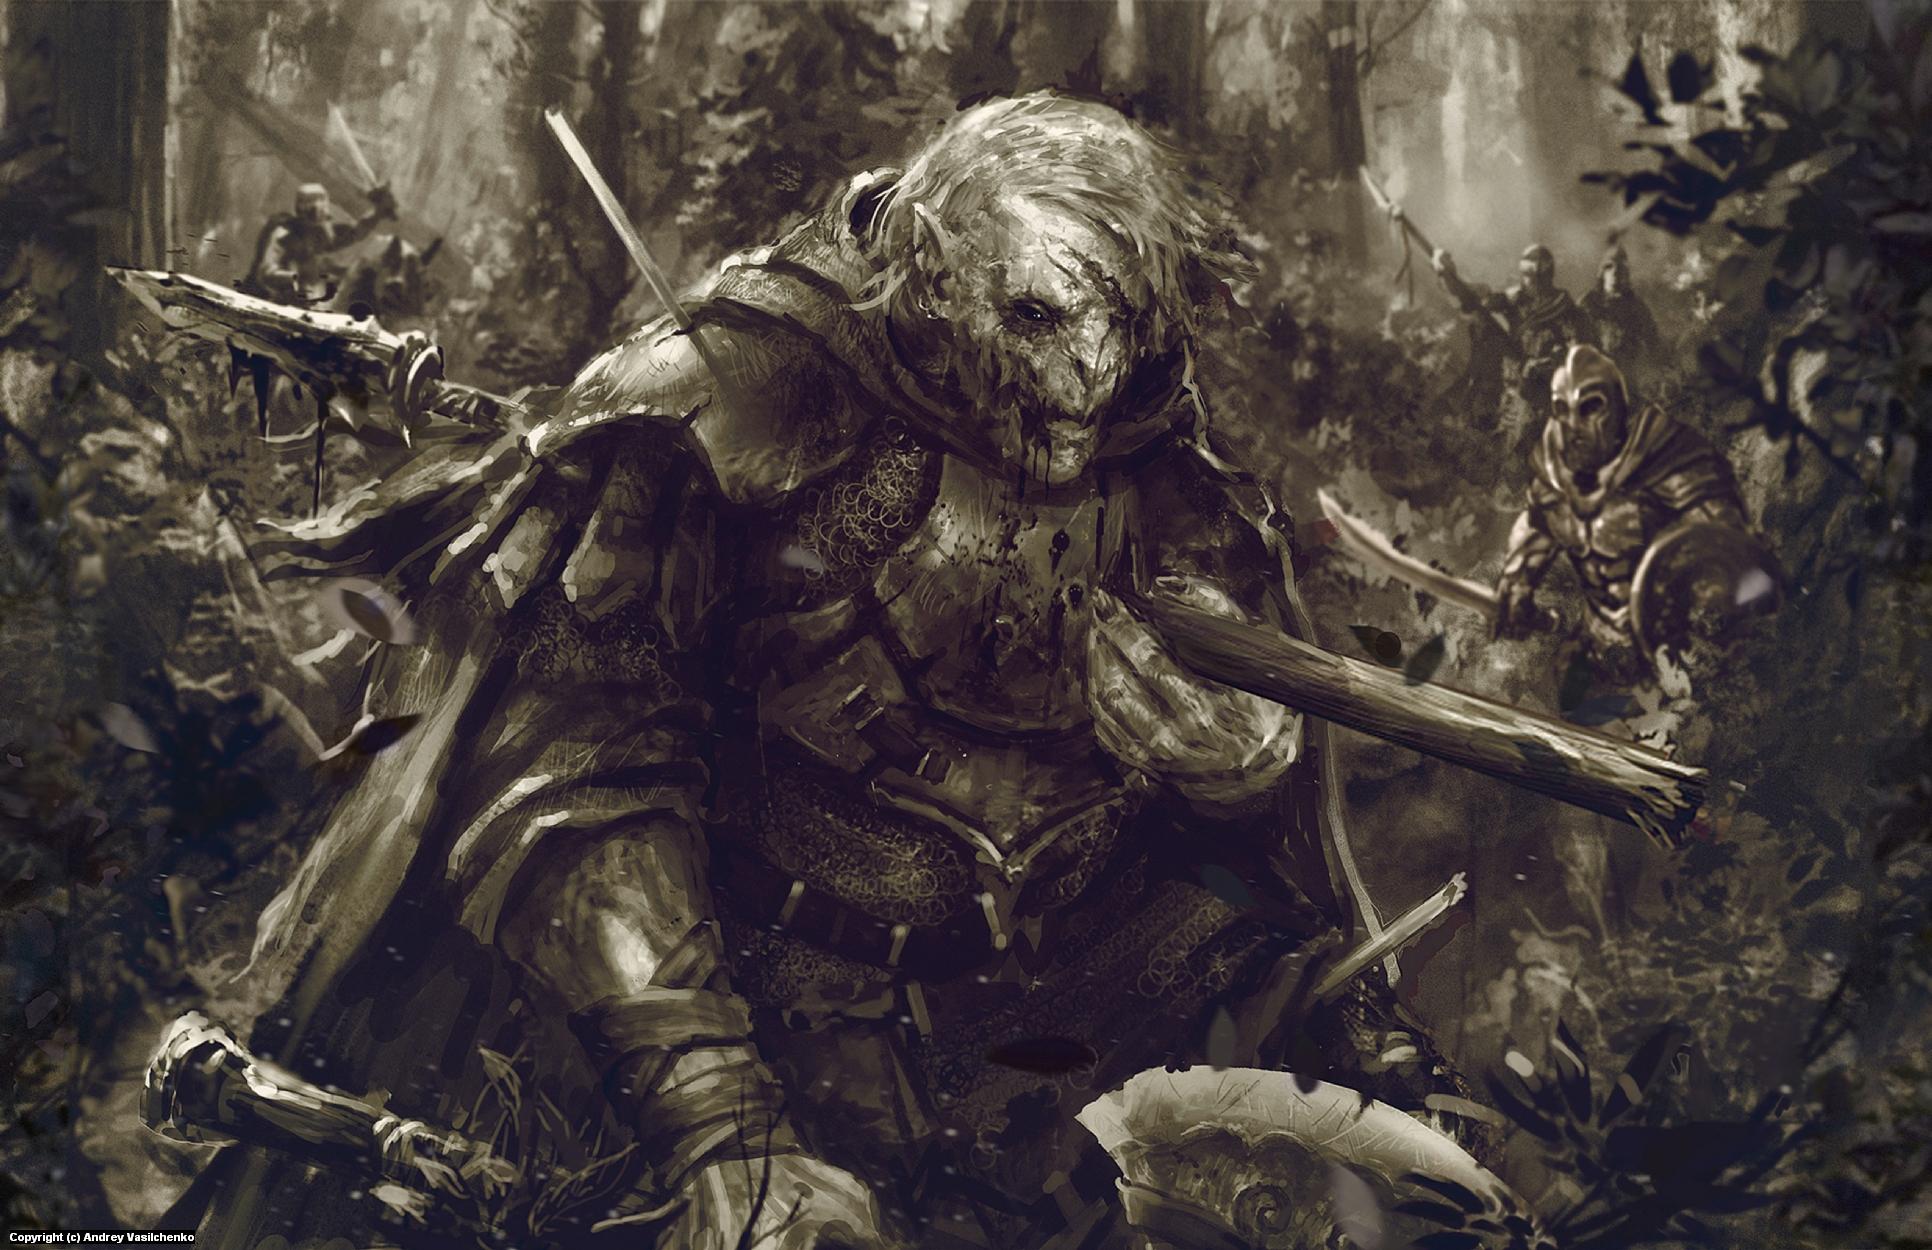 The Hunt Artwork by Andrey Vasilchenko